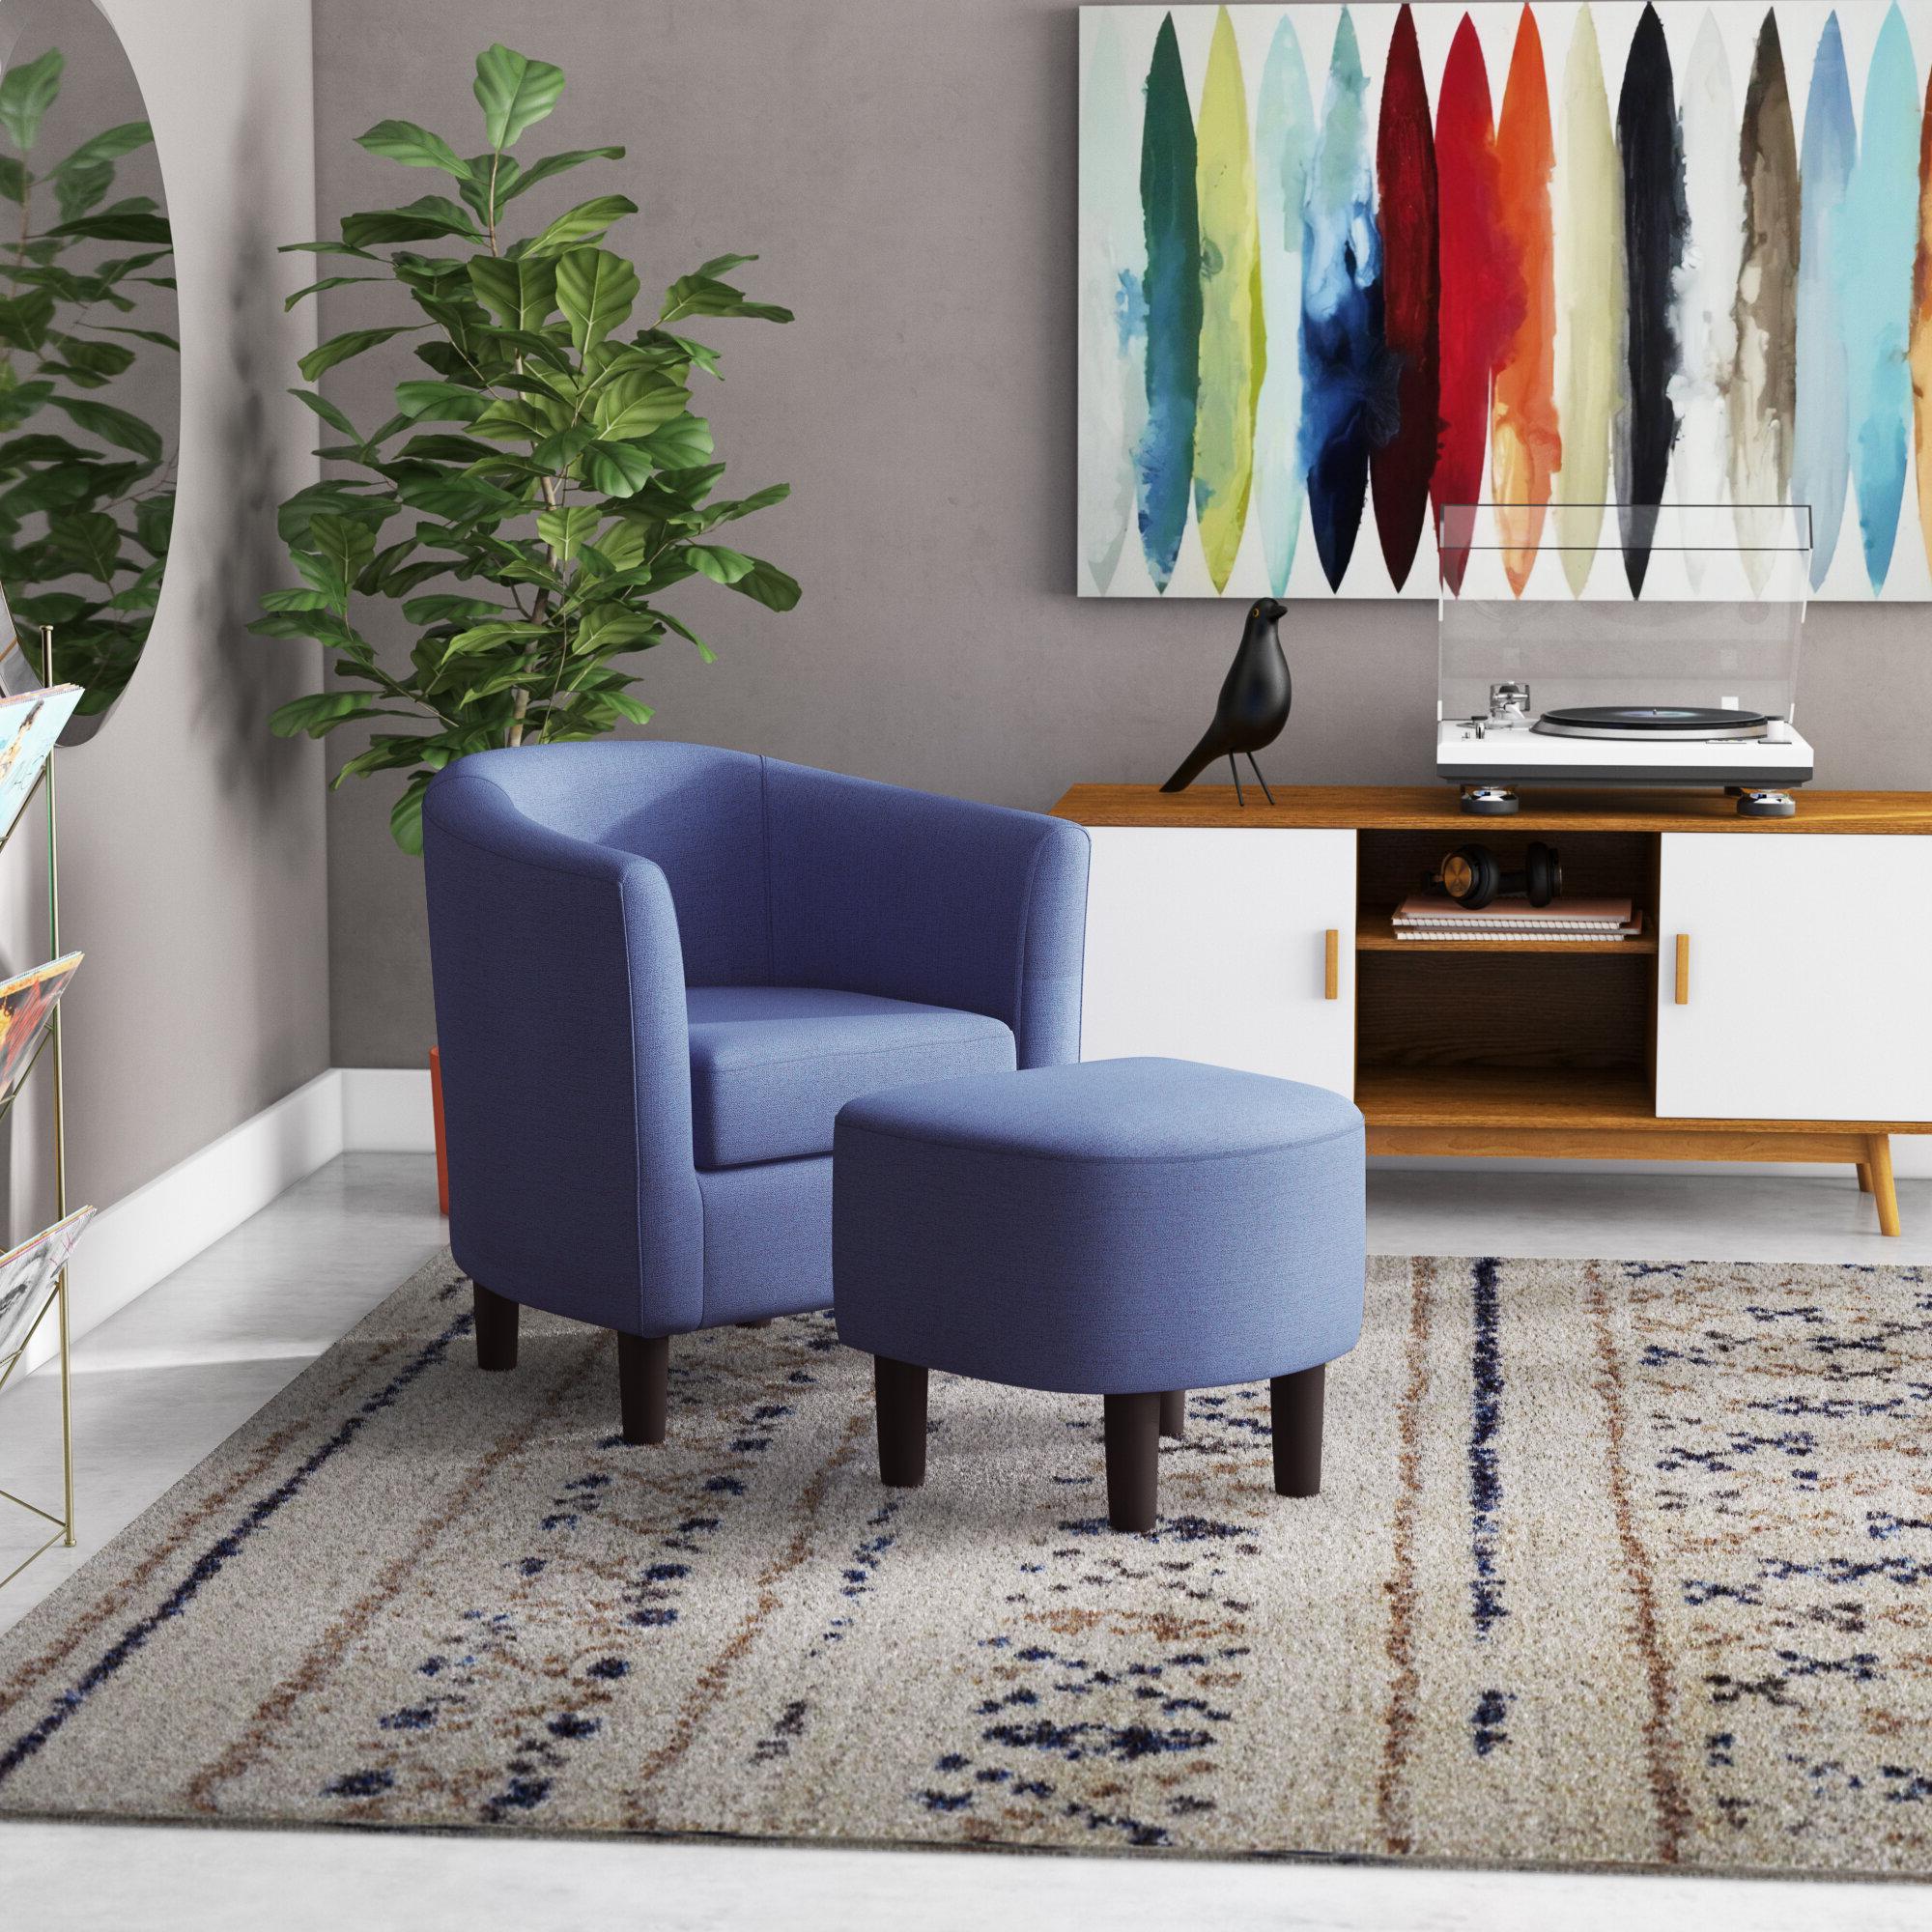 Harmon Cloud Barrel Chairs And Ottoman Regarding Most Popular Latitude Run® Jazouli Linen Barrel Chair And Ottoman (View 3 of 20)